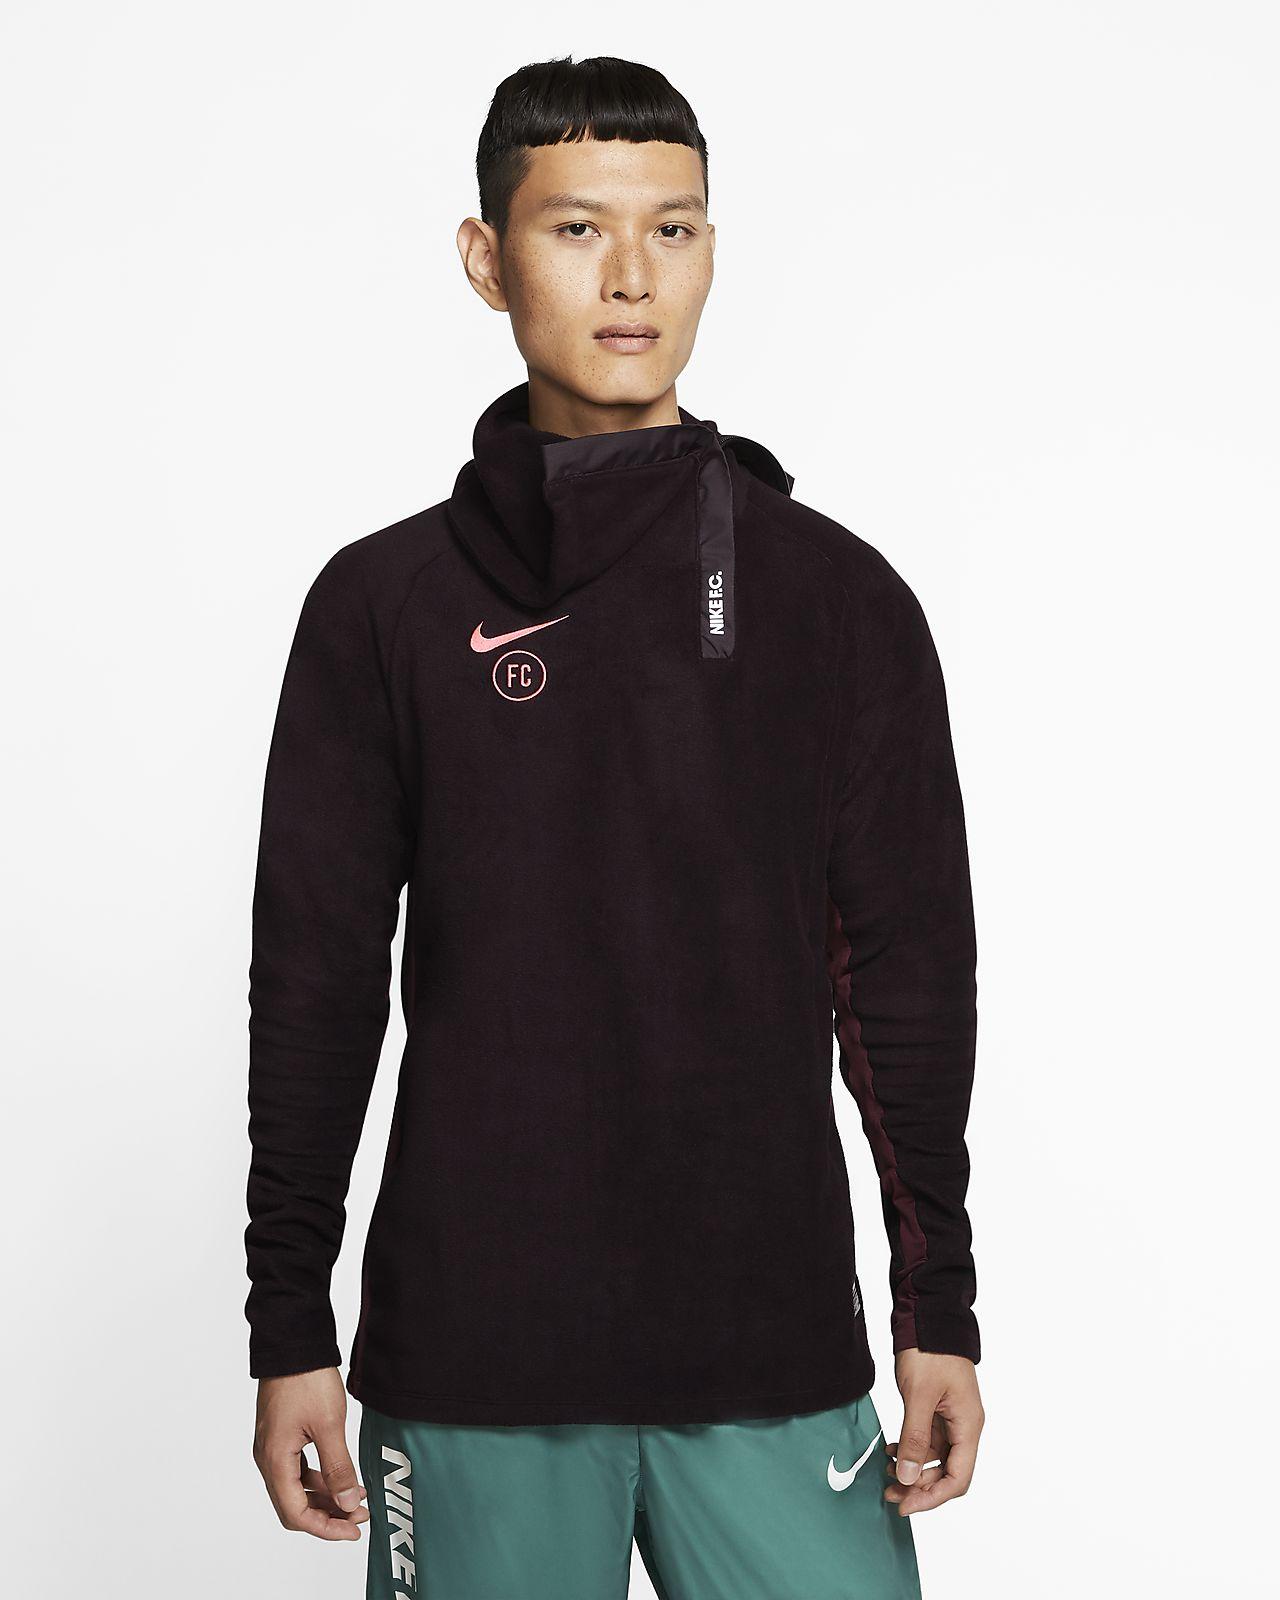 Męska treningowa koszulka piłkarska Nike F.C.